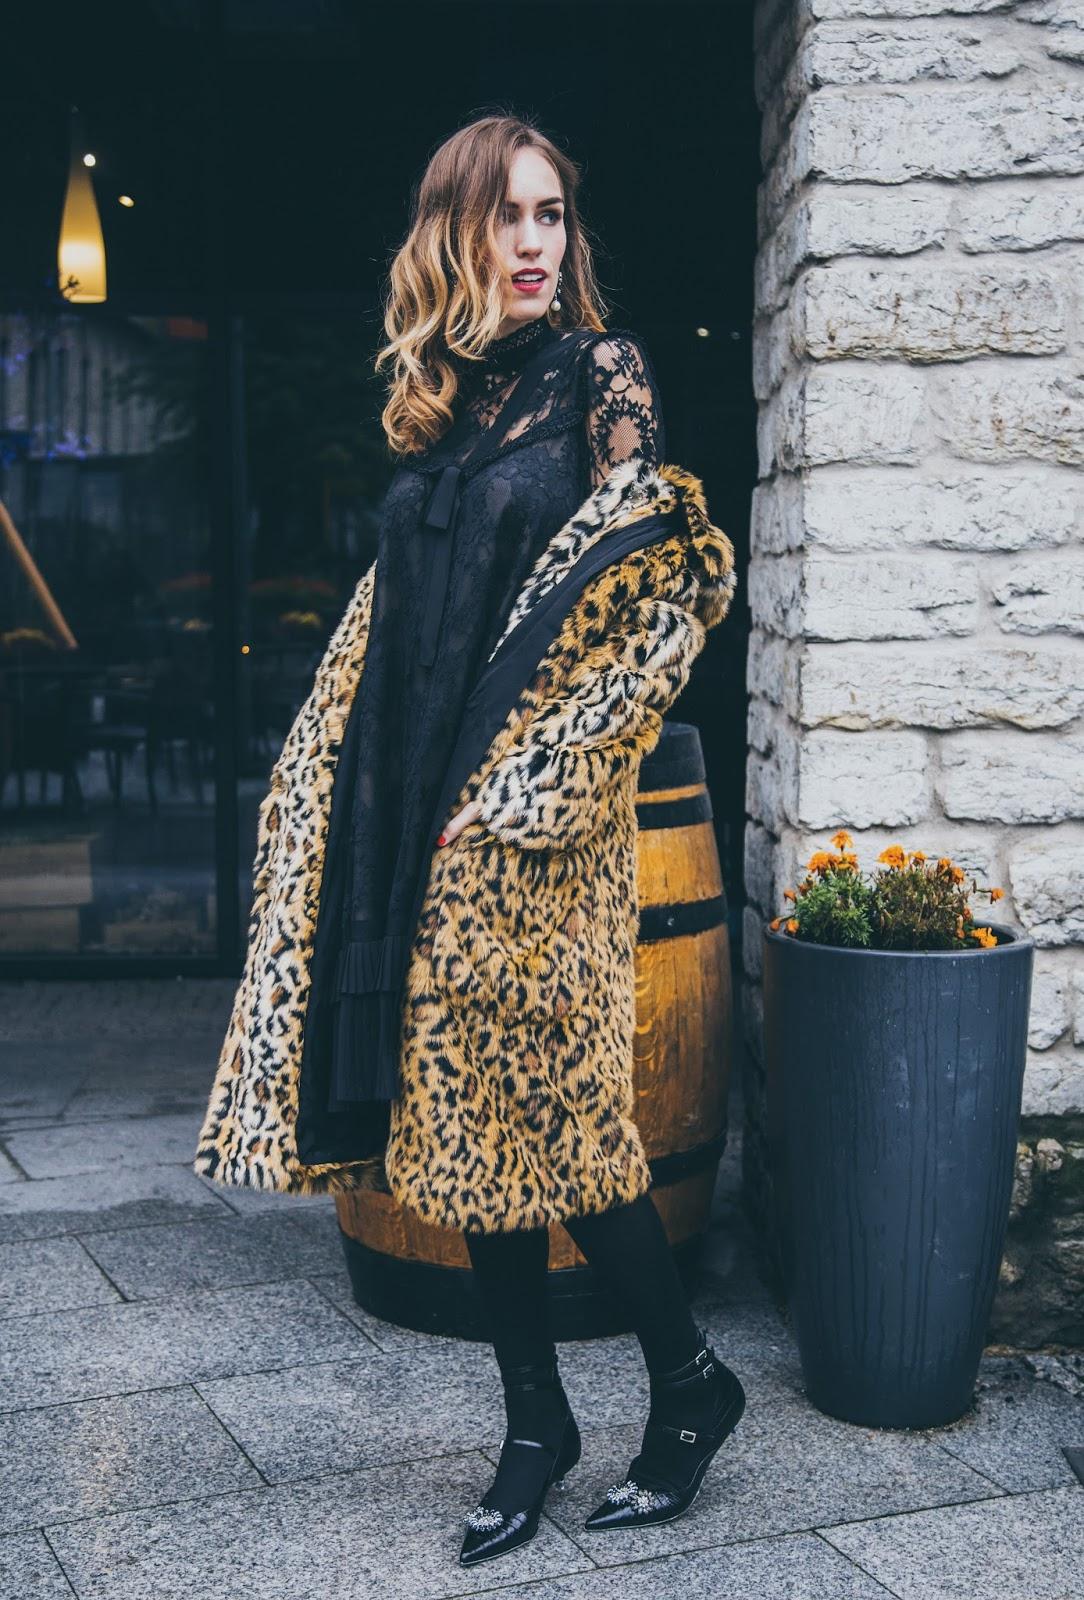 erdem x hm collaboration collection leopard coat kitten heels